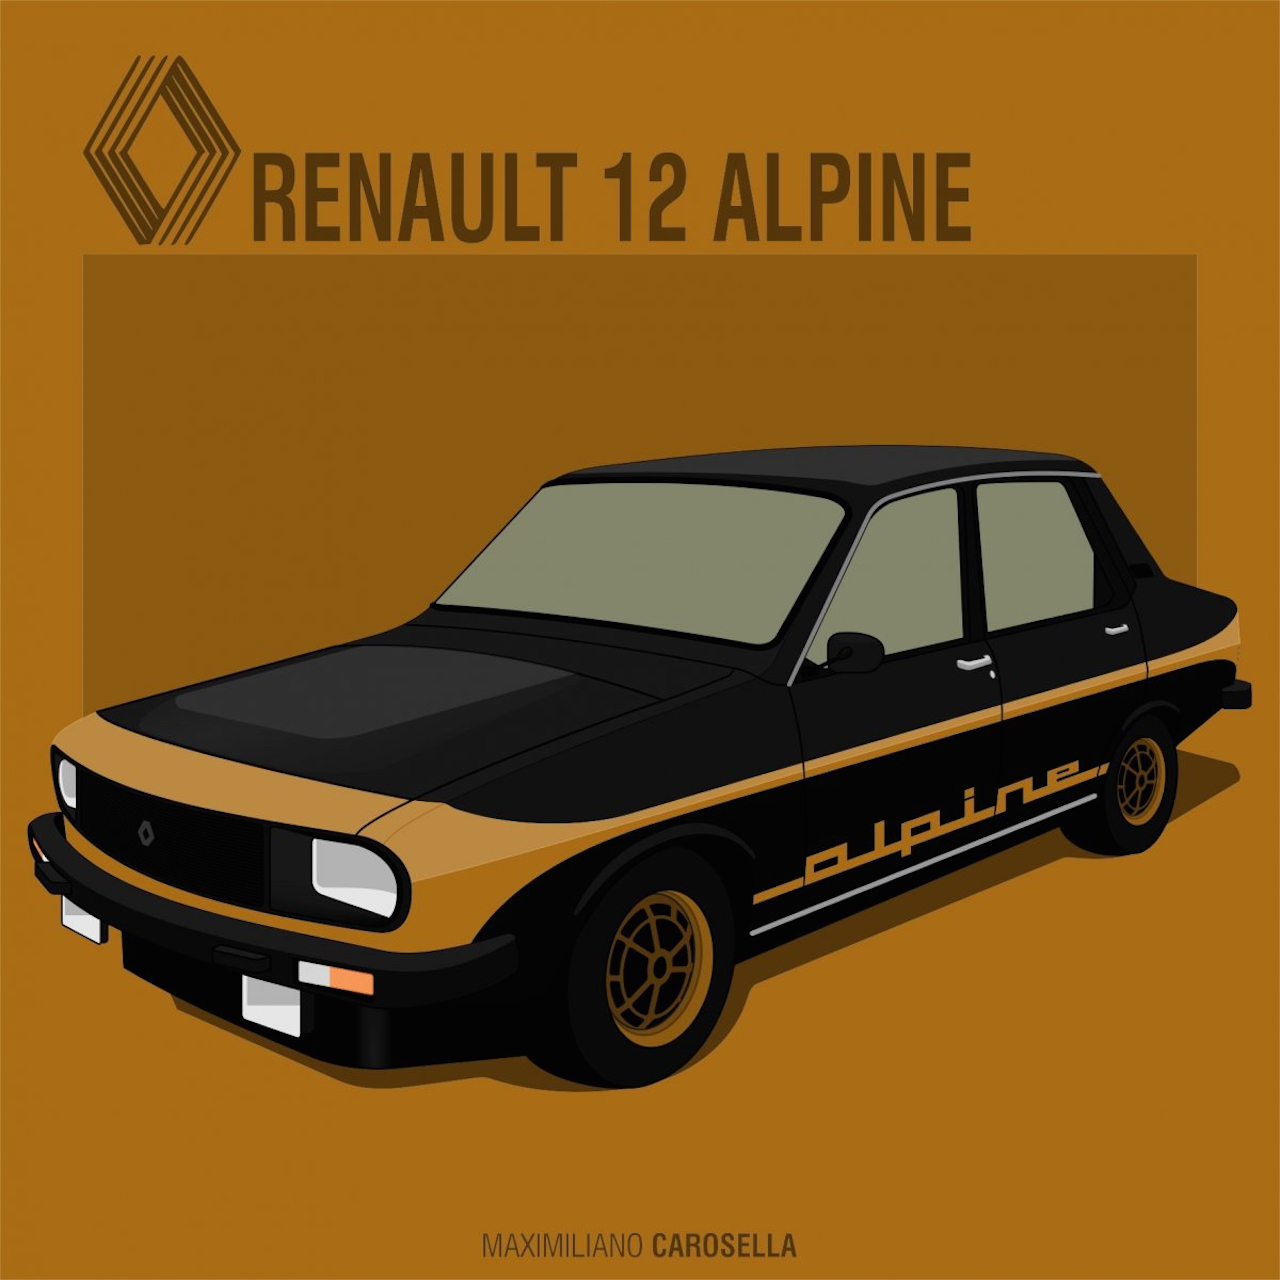 Renault 12 Alpine : Paris Latino ! 29